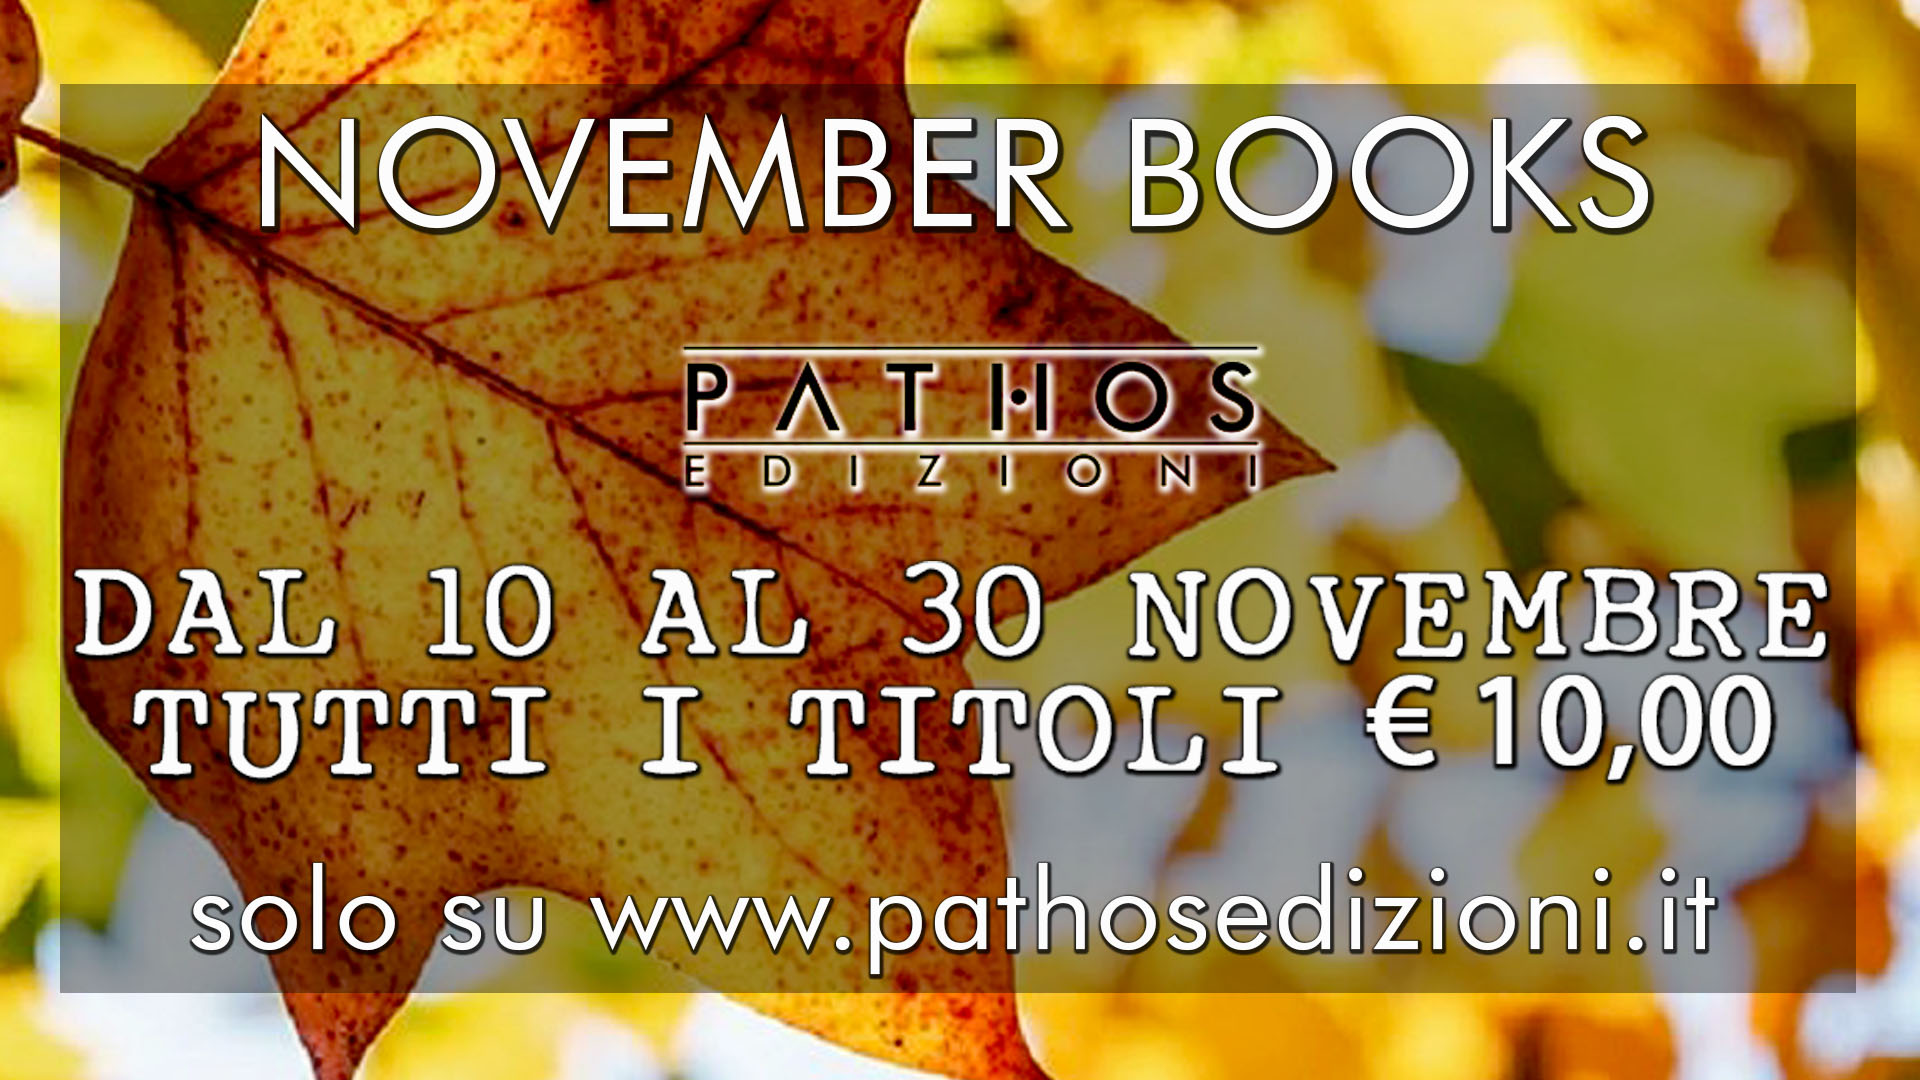 Novembre a 10 euro - Pathos Edizioni